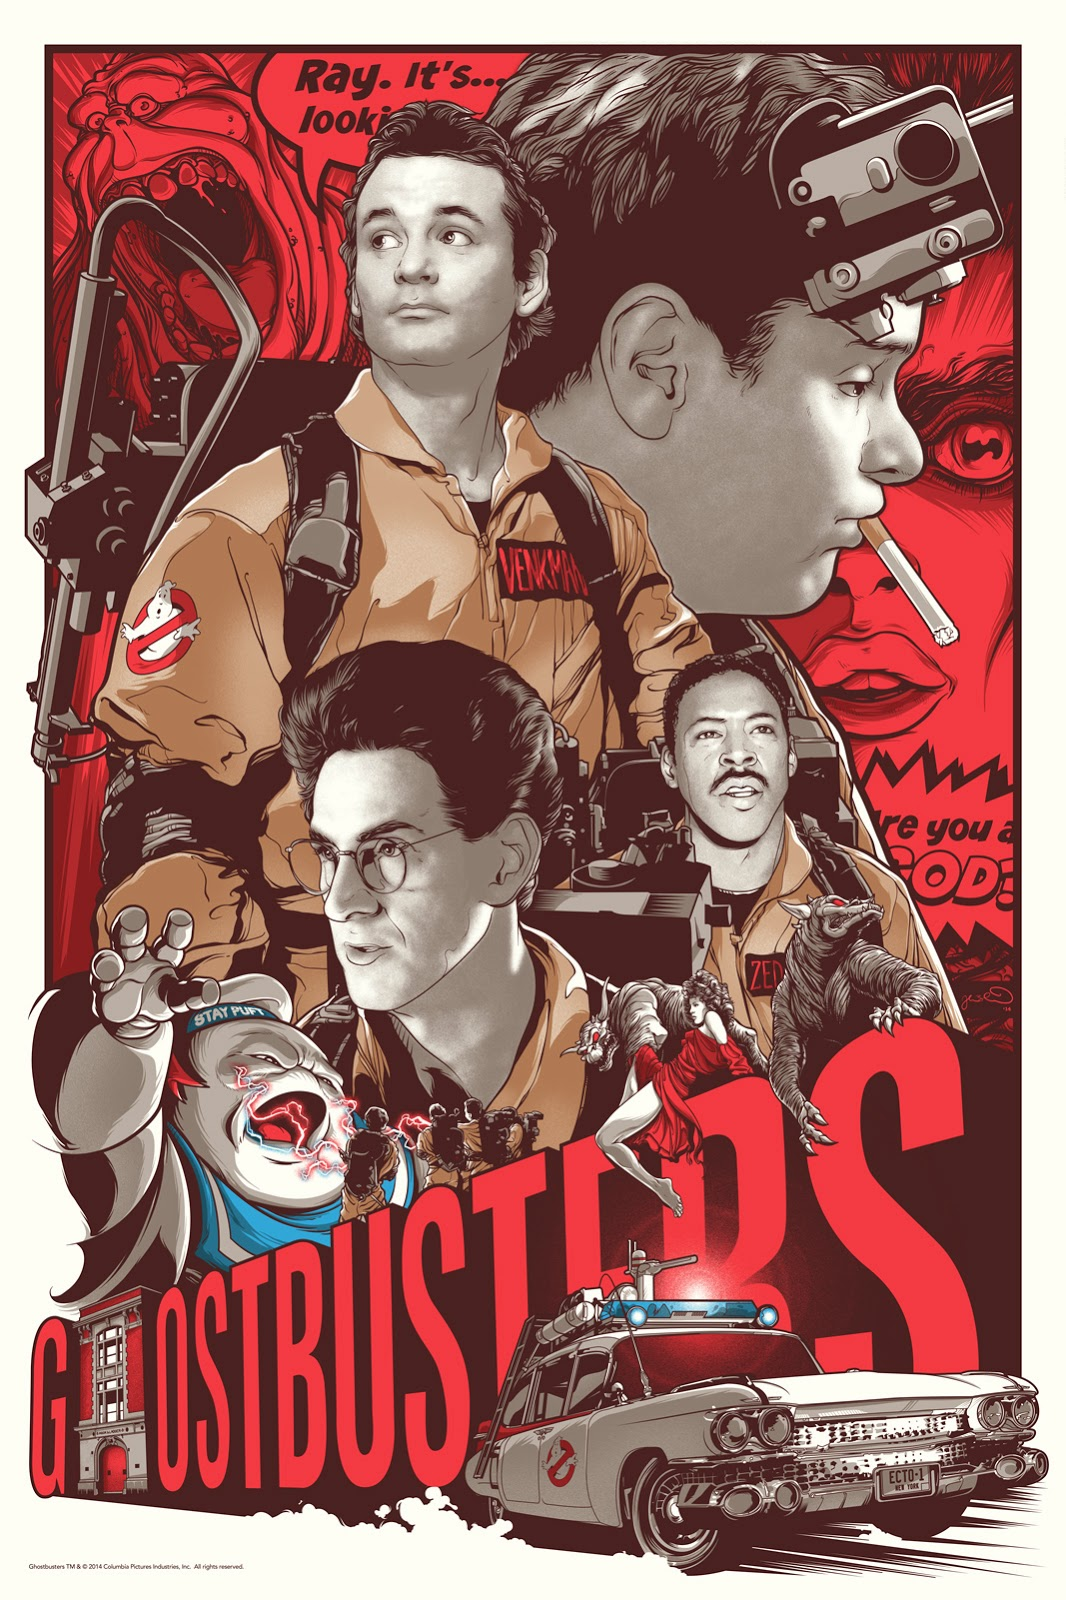 ghostbusters-joshua-budich-poster-gallery1988.jpg